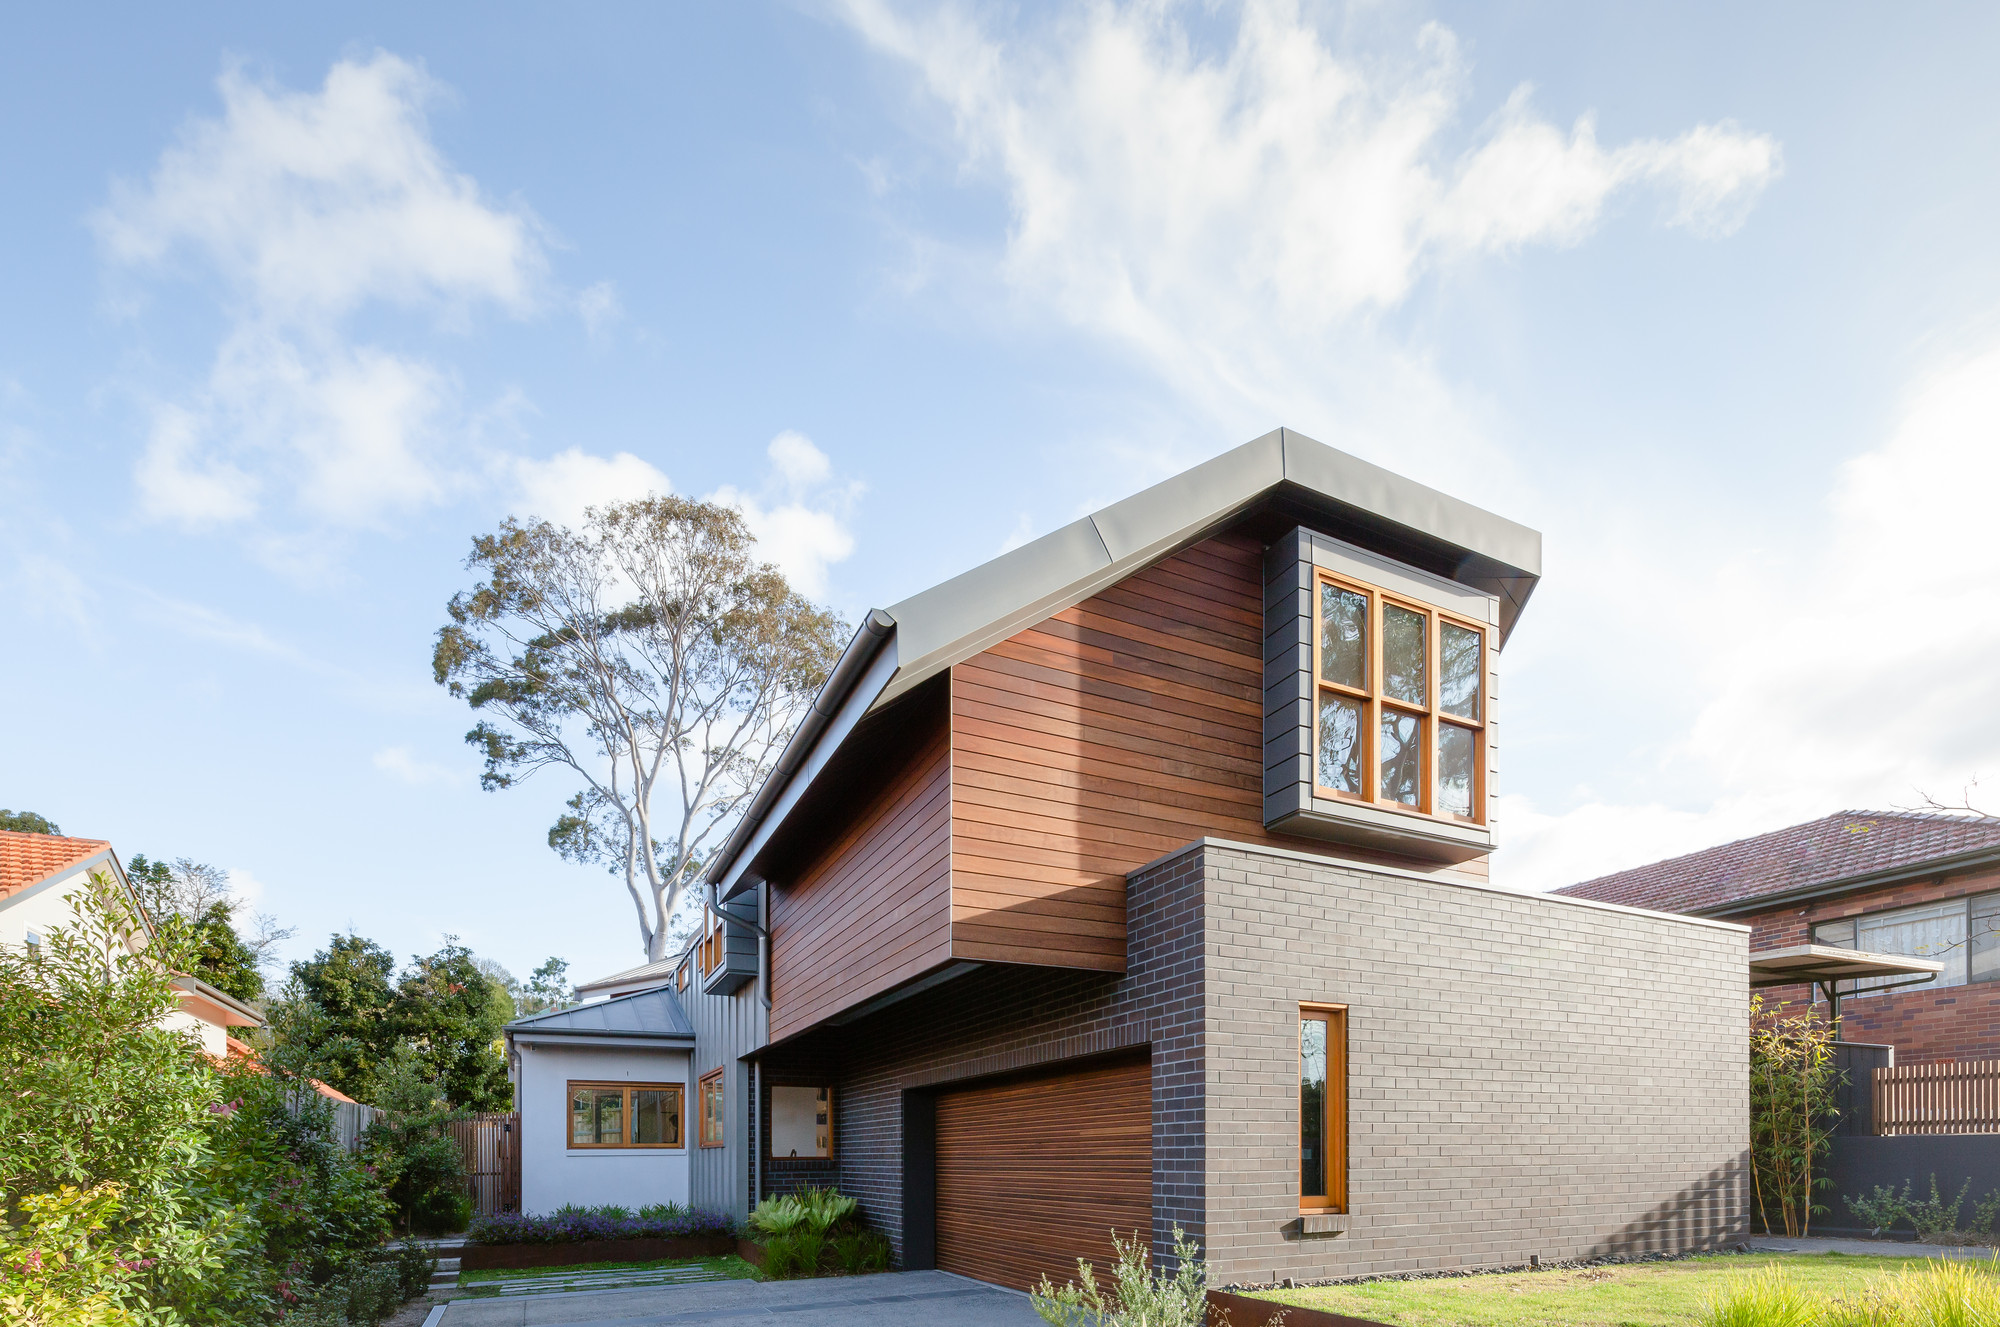 naremburn house bijl architecture archdaily. Black Bedroom Furniture Sets. Home Design Ideas